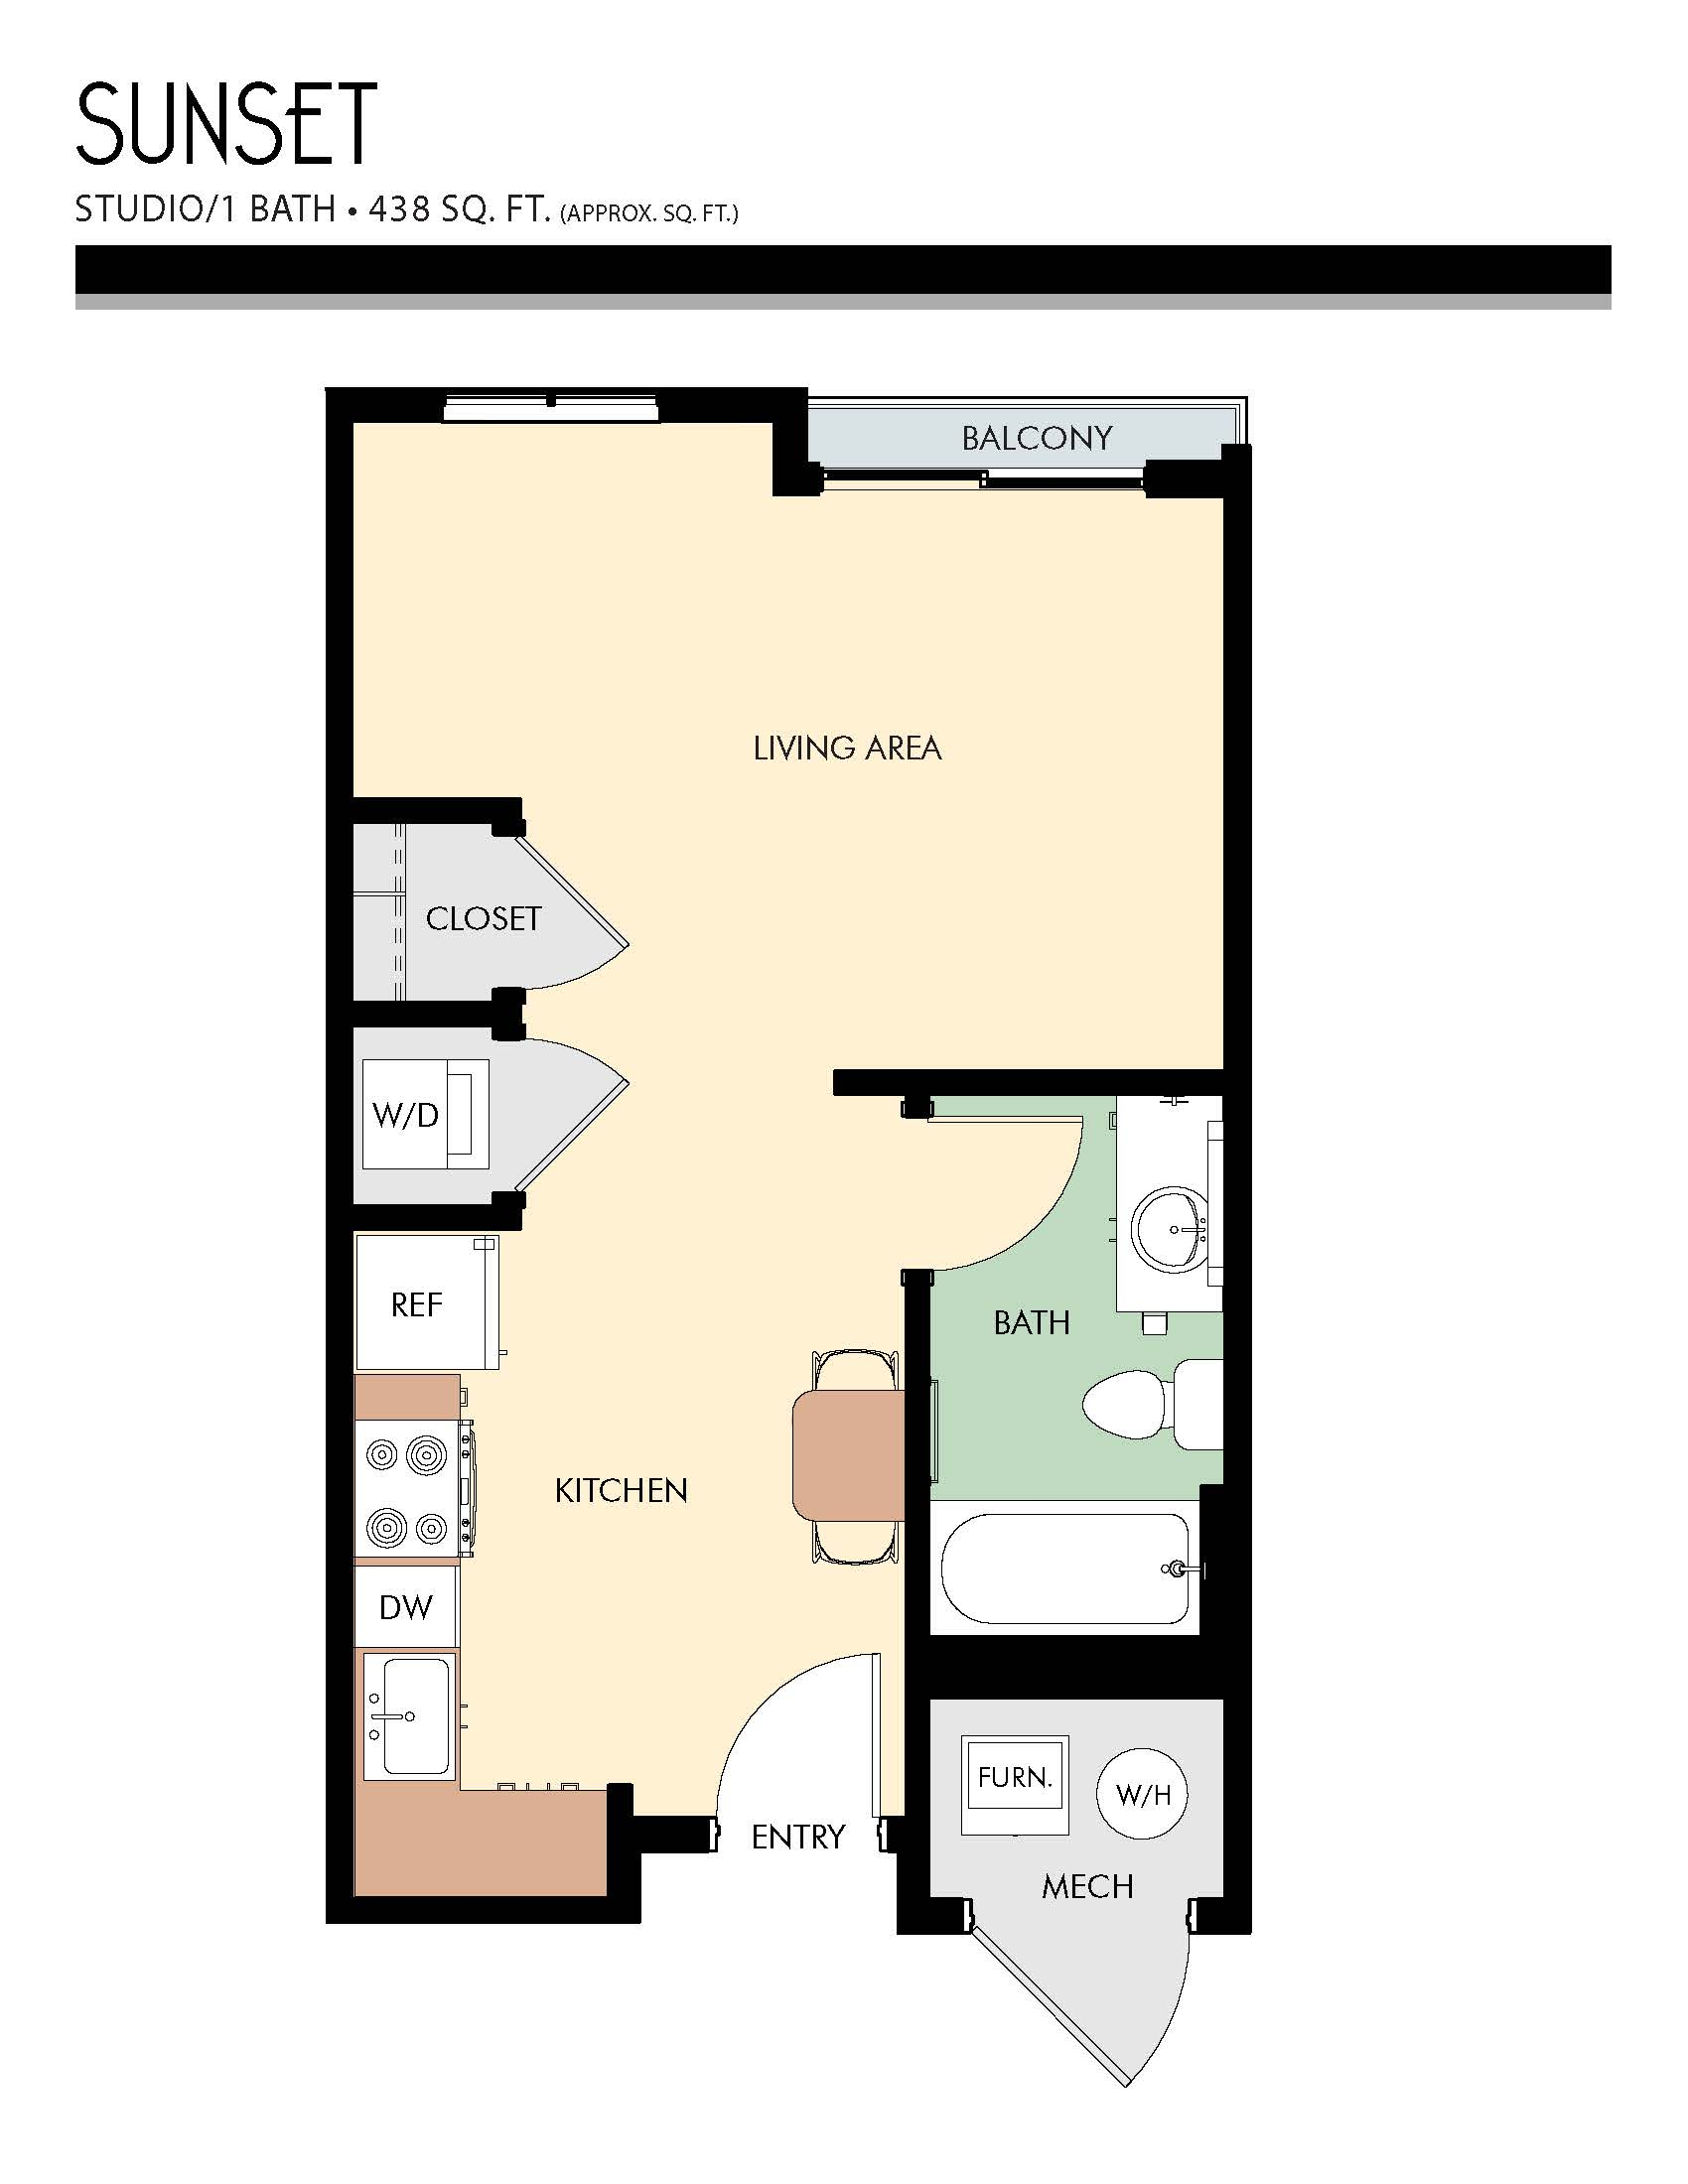 SUNSET floor plan -  Studio / 1 Bath (438 Sq Ft)